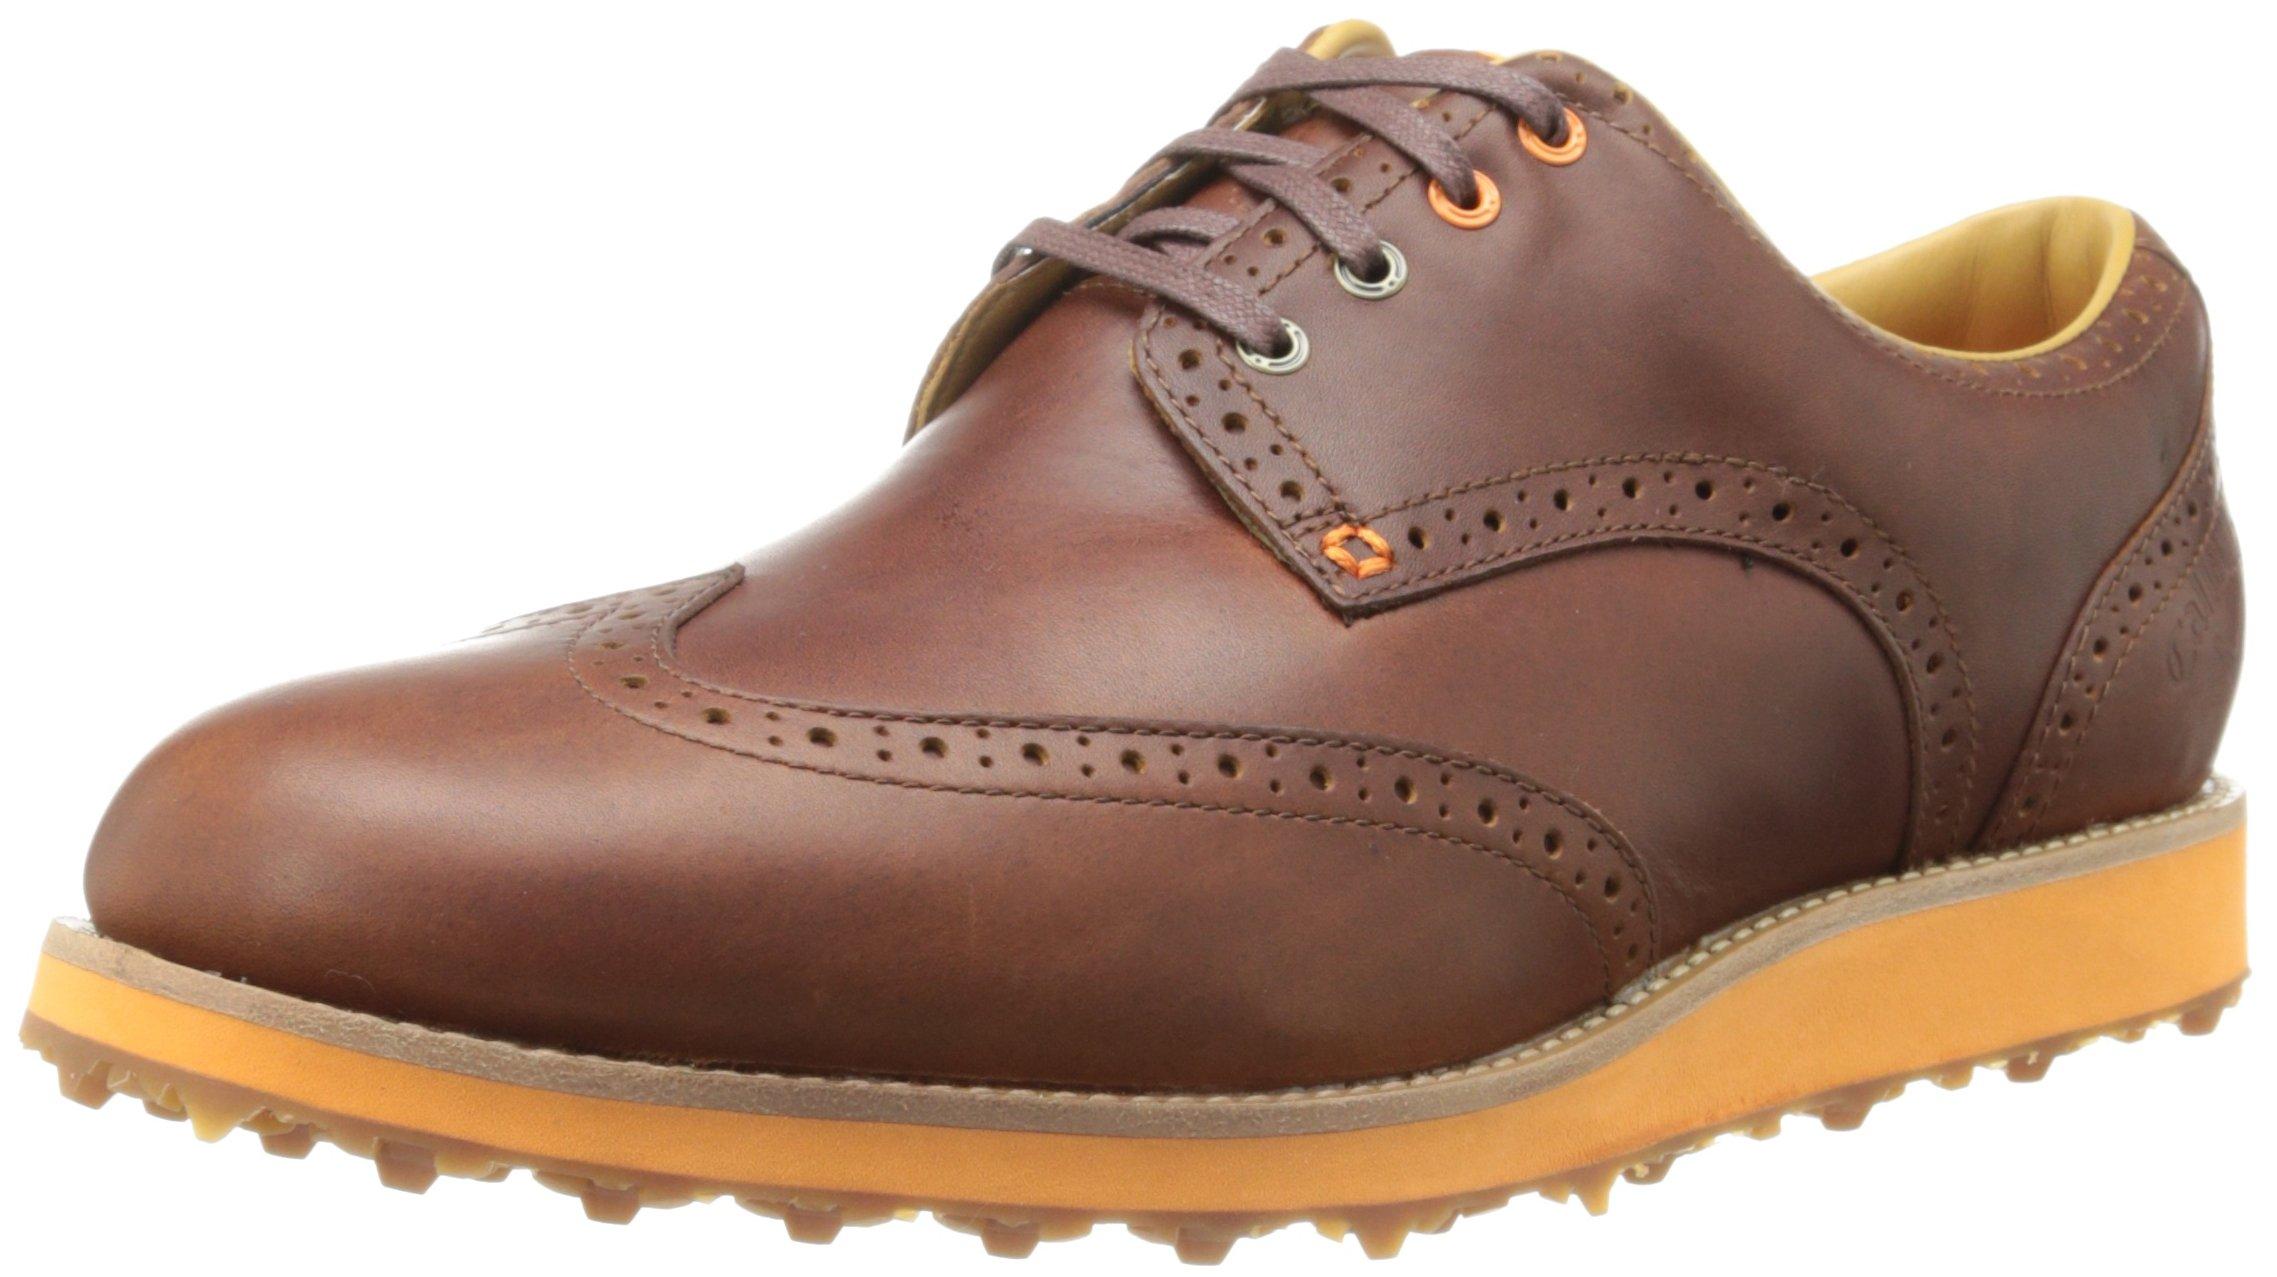 Callaway Footwear Men's Master Staff Brogue Full Grain Leather Golf Shoe, Brown/Brown, 9.5 M US